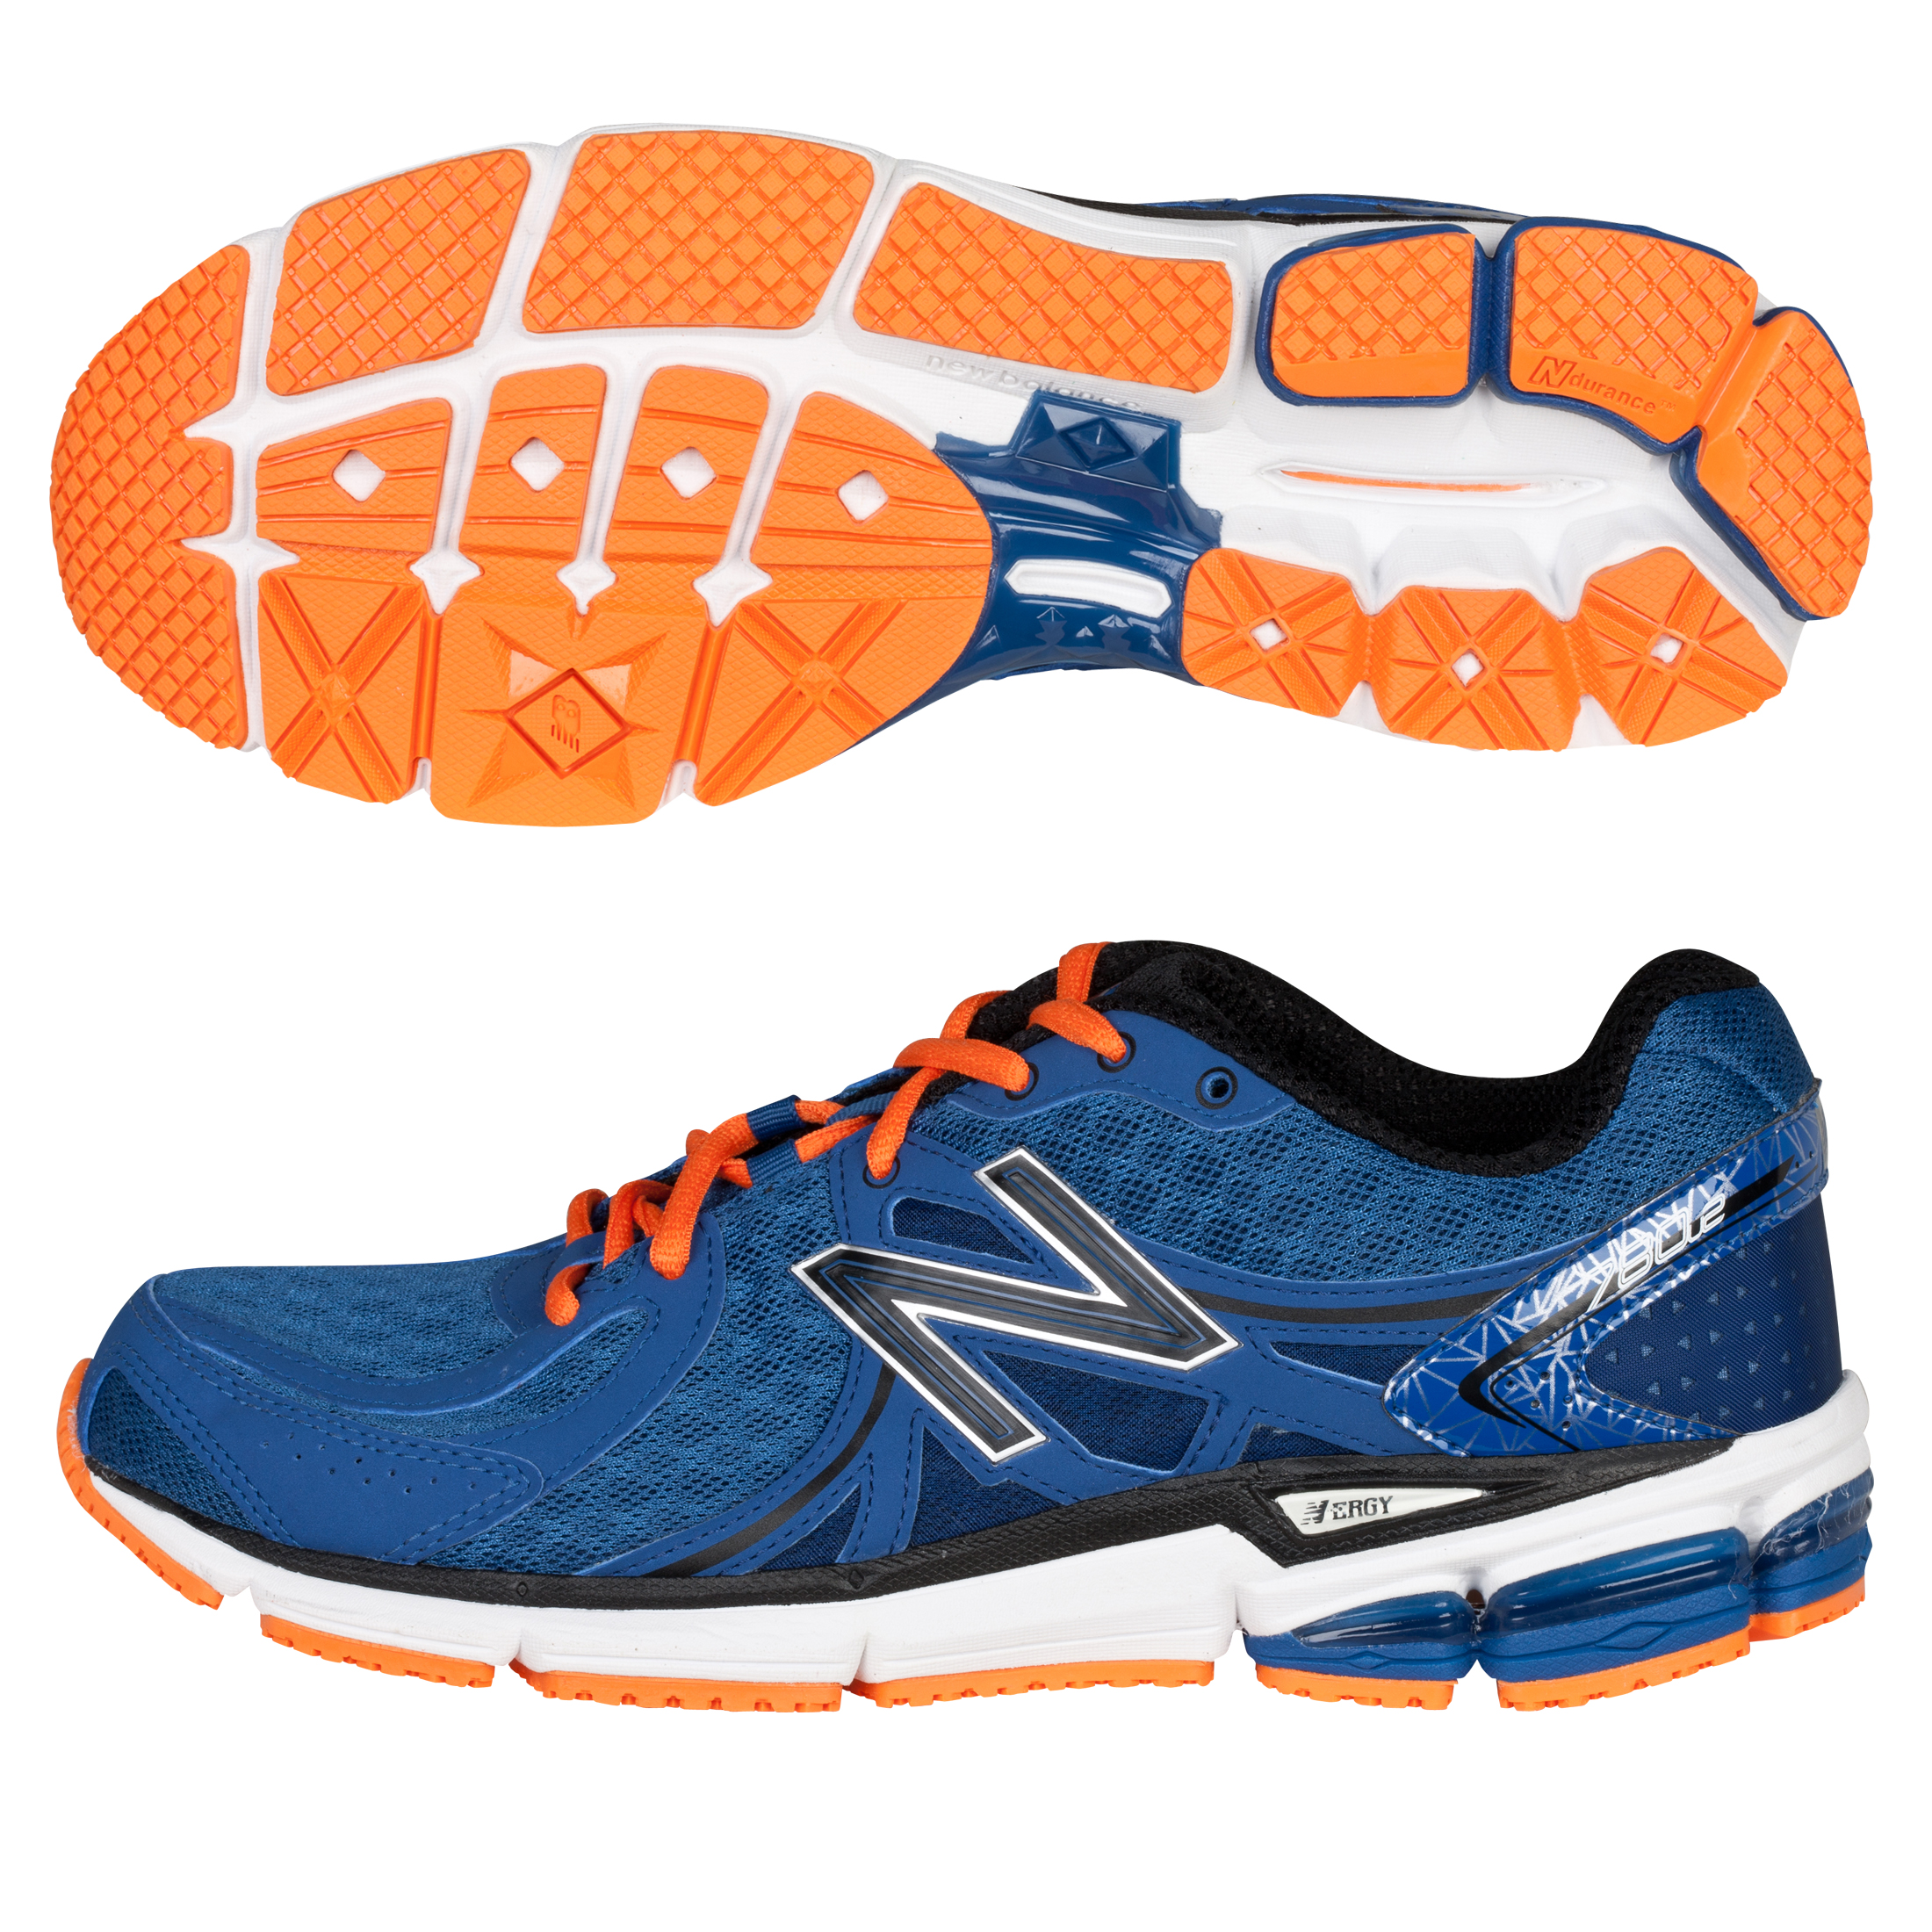 New Balance 780V2 Trainers - Blue/Orange